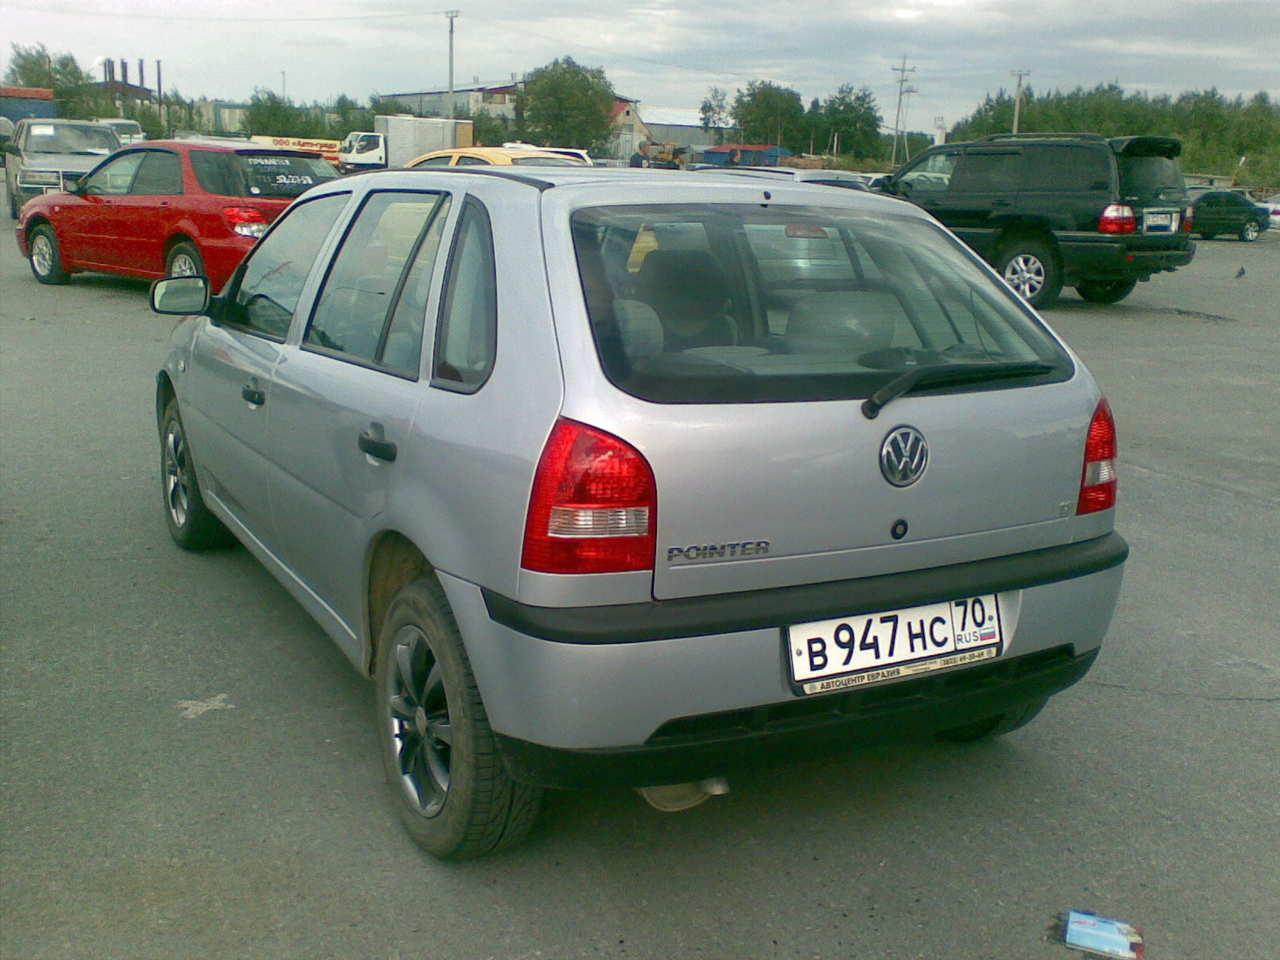 2005 Volkswagen Pointer Pictures, 1.8l., Gasoline, FF, Manual For Sale